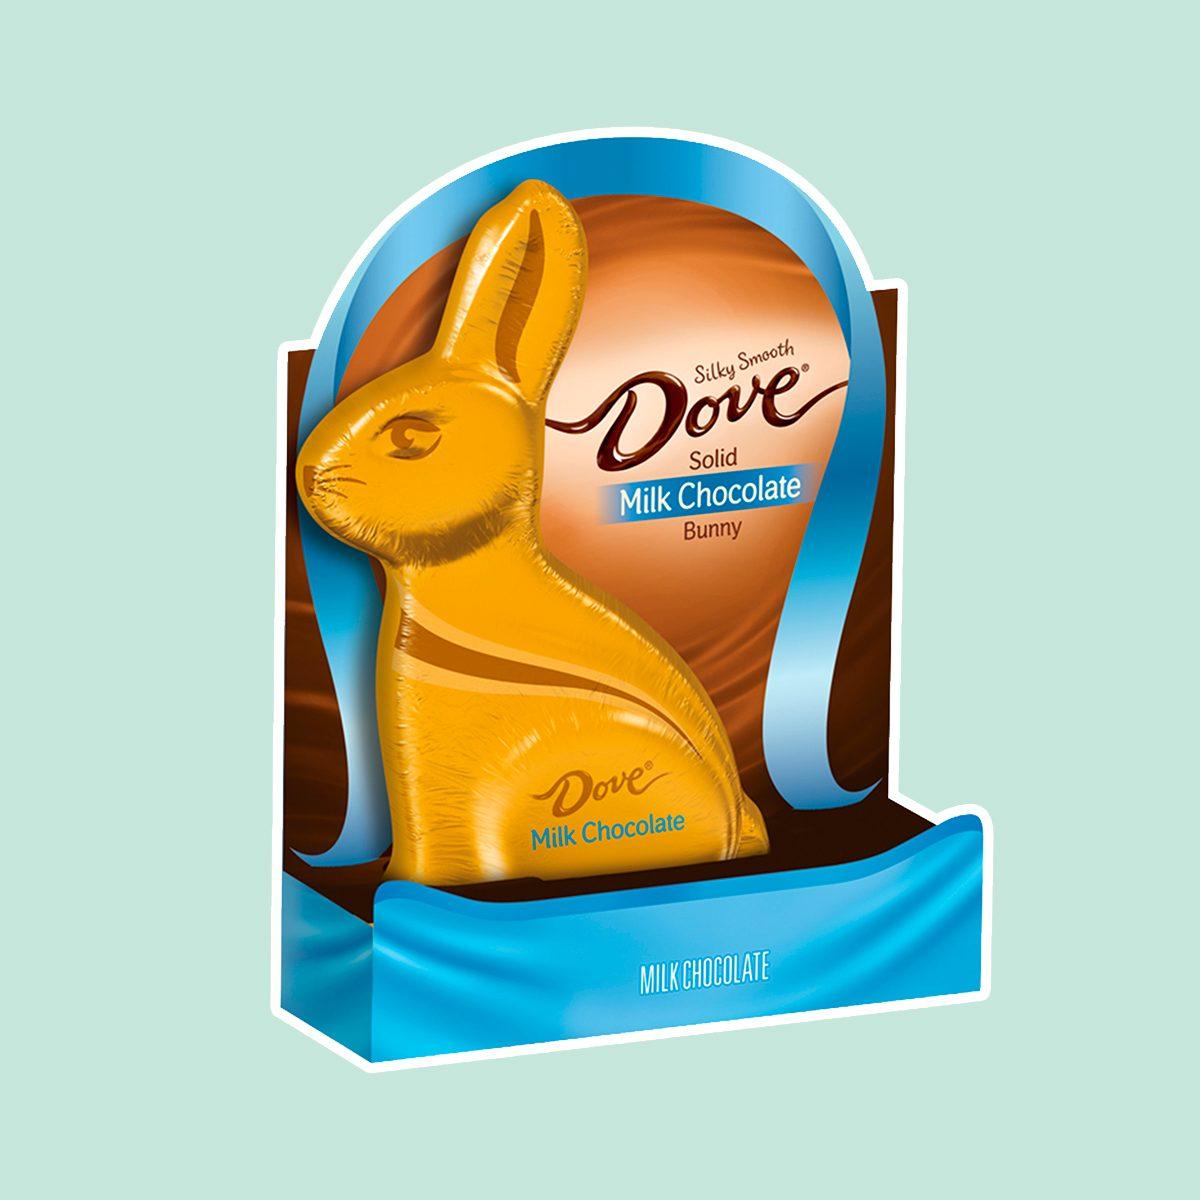 DOVE Solid Milk Chocolate Bunny